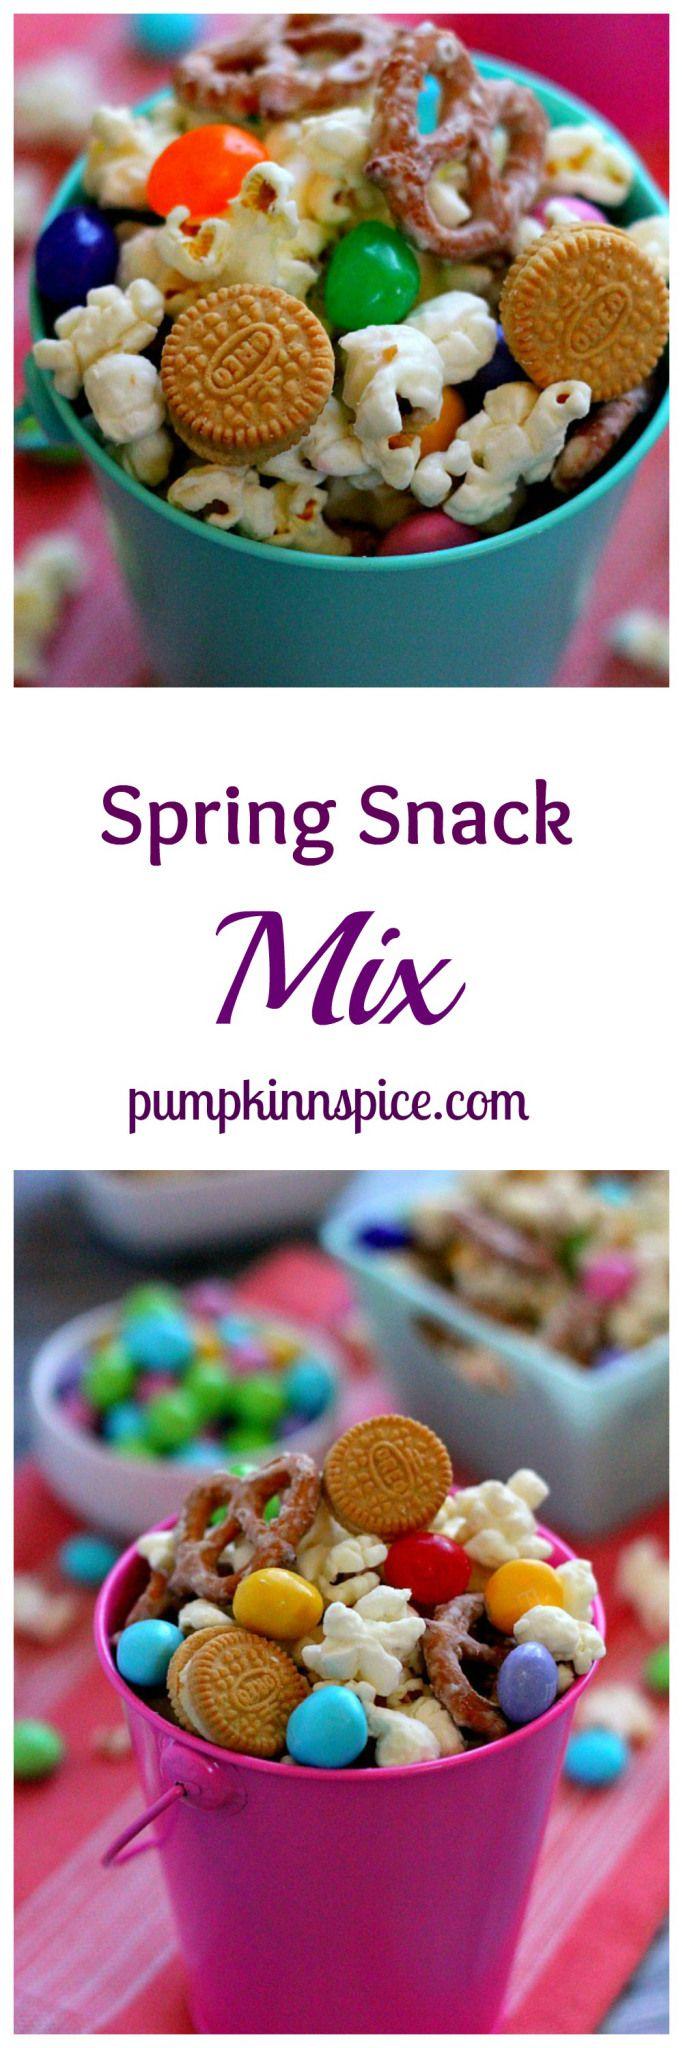 Spring Snack Mix   www.pumpkinnspice.com